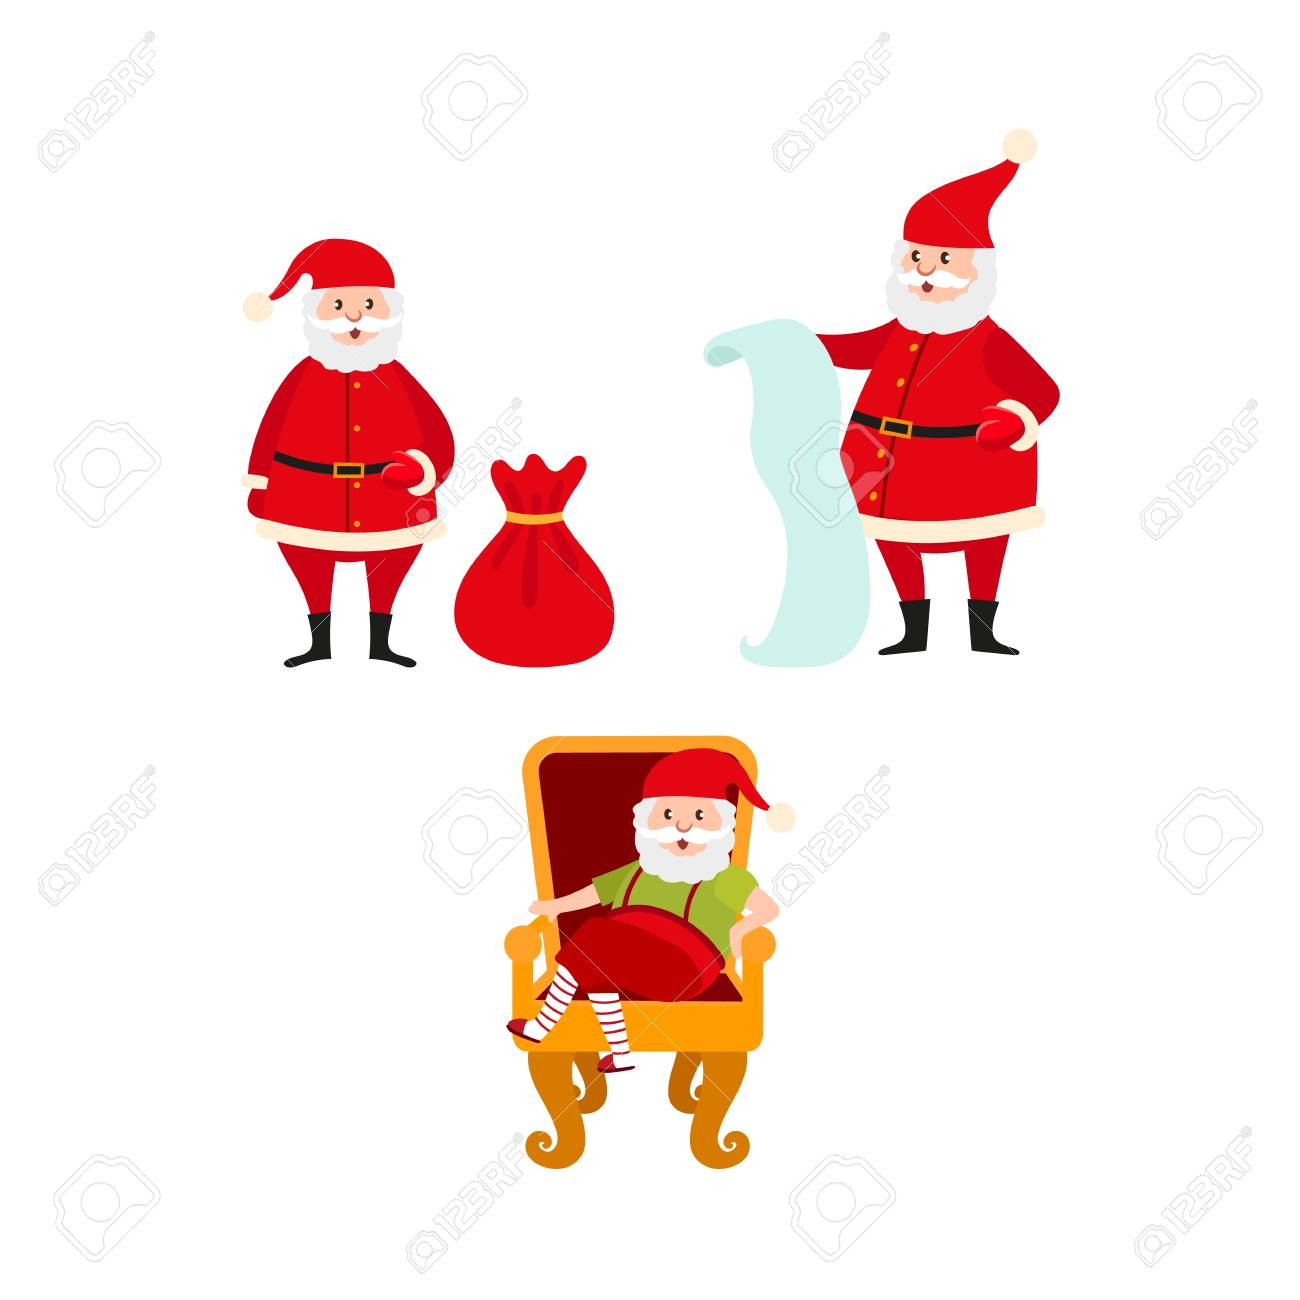 Vector Flat Cartoon Santa Claus In Christmas Stockings And Hat ...